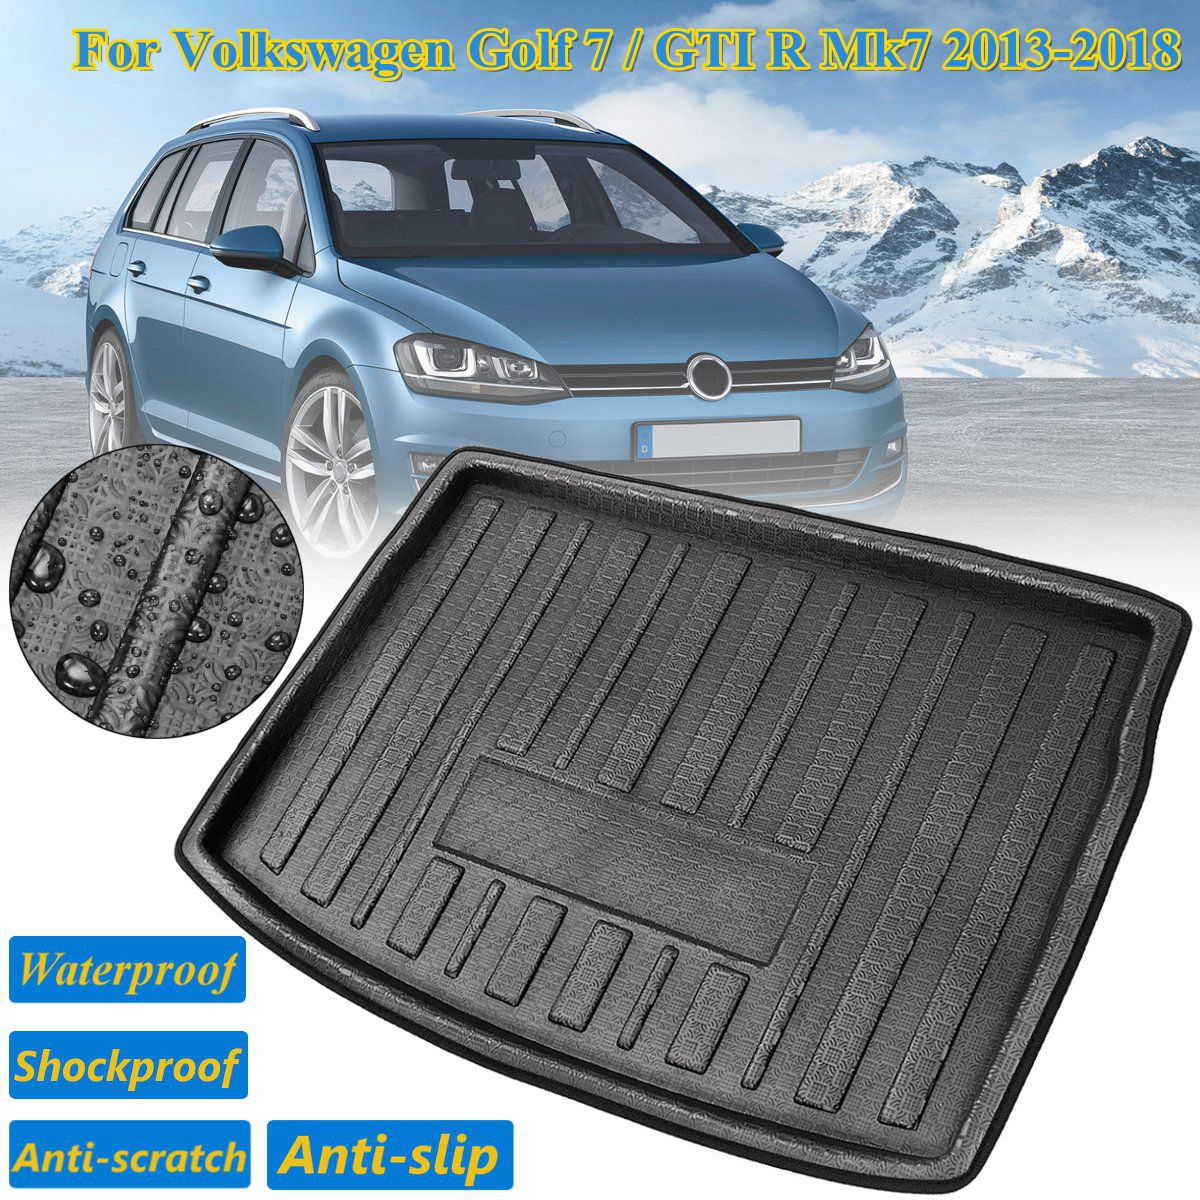 VW PASSAT B6 B7 2005-2015 ESTATE Only Boot Liner Trunk Insert Dog Mat Tray